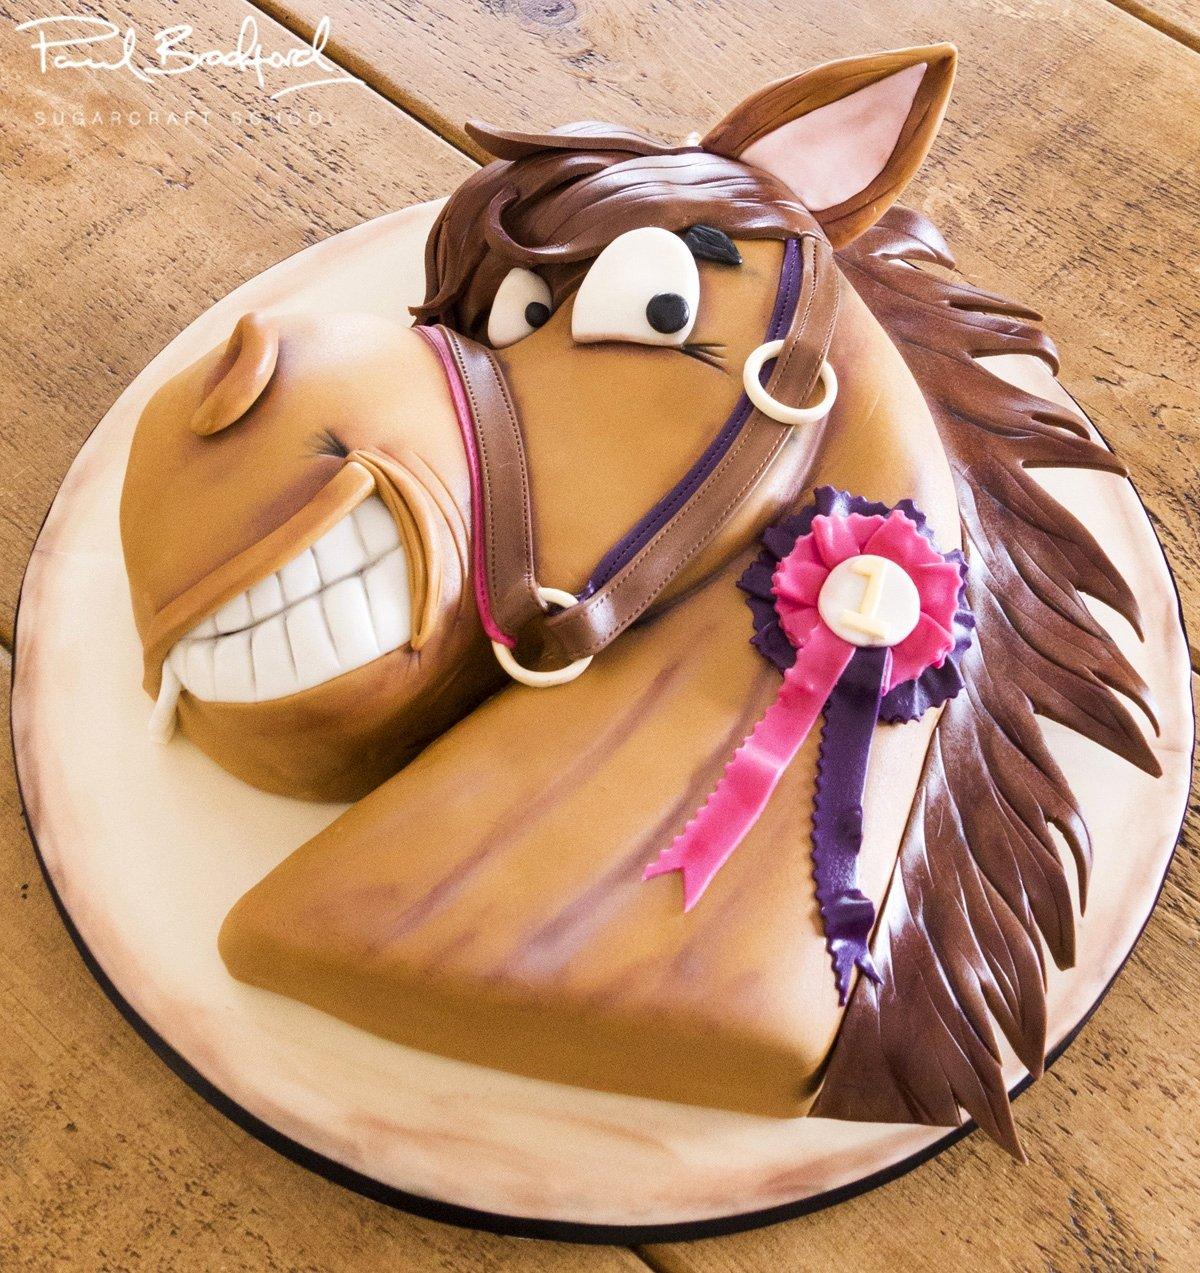 Horse Cake Template Lovely Horse Head Template for Cake